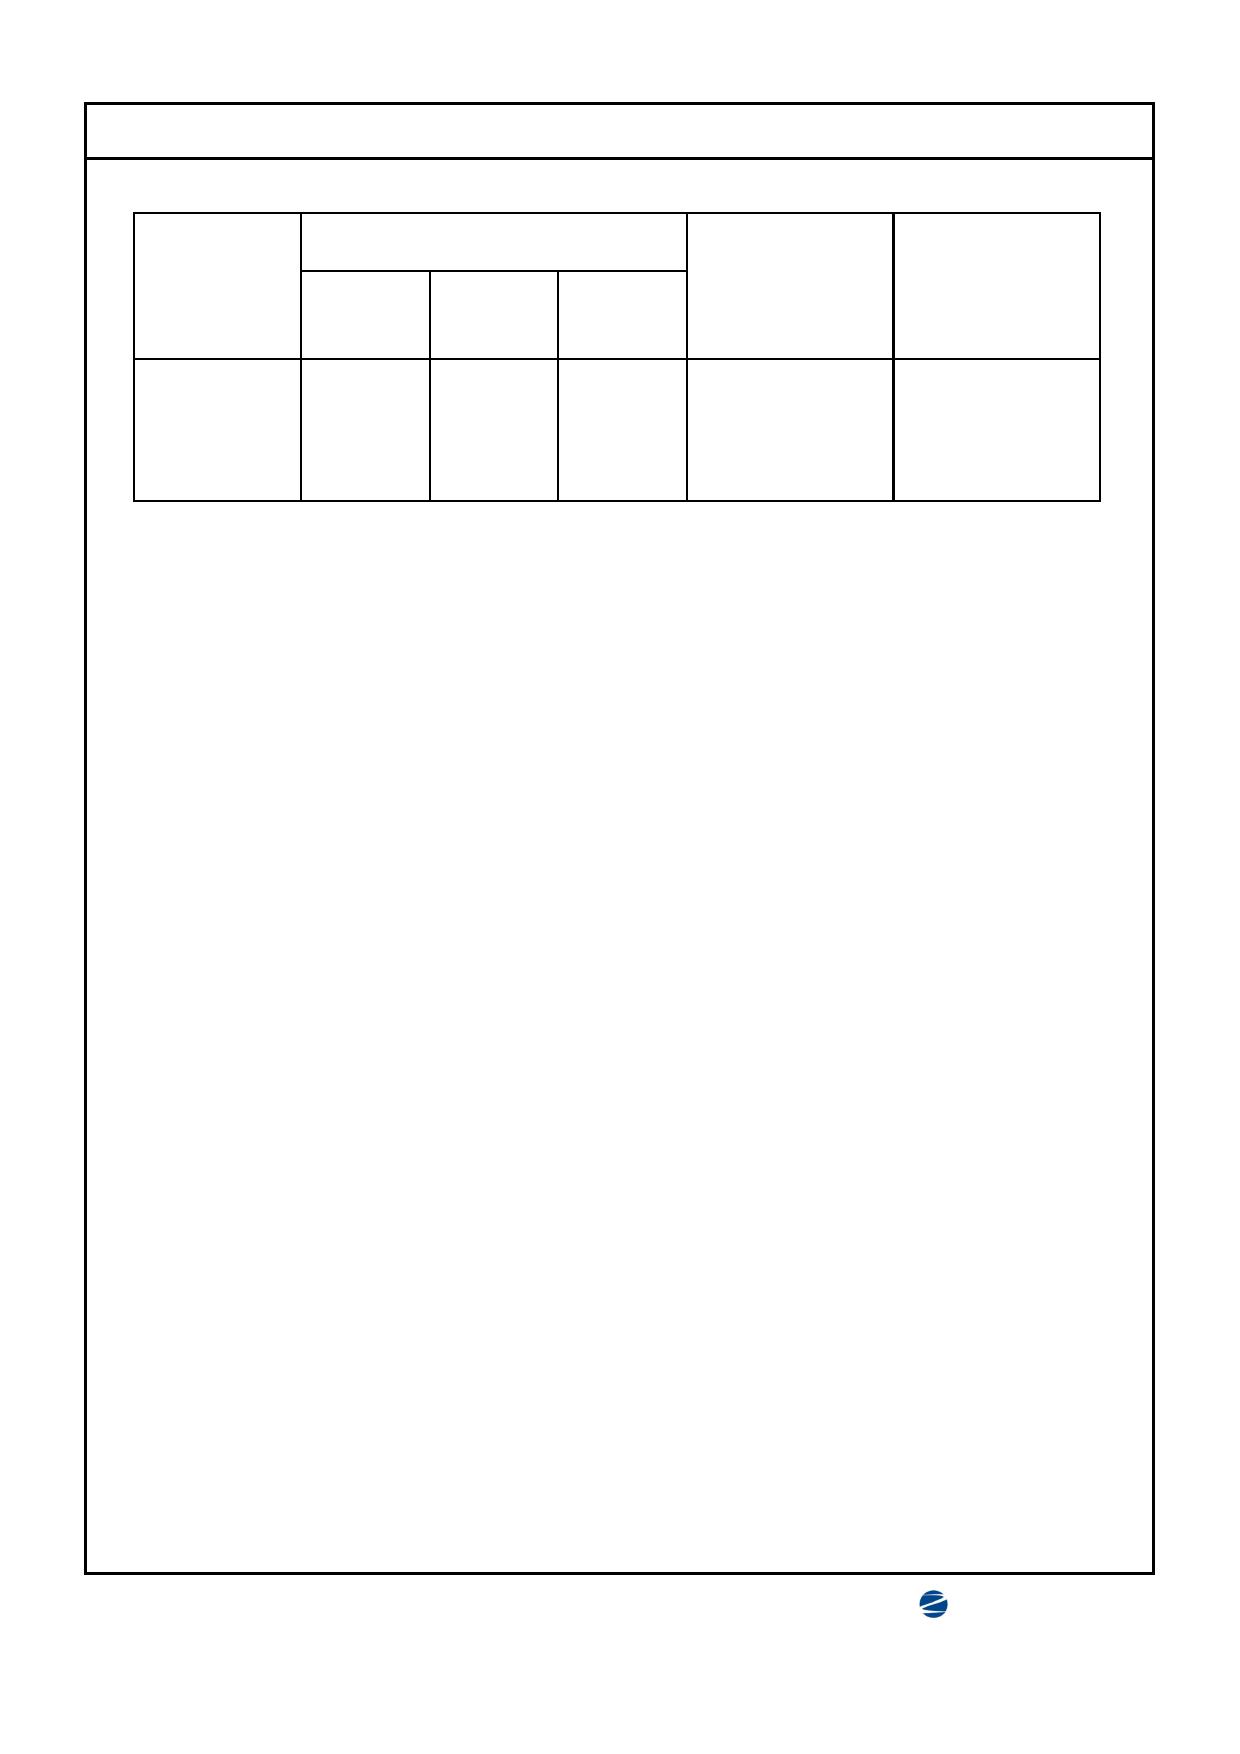 MBR30100CFSH pdf, ピン配列